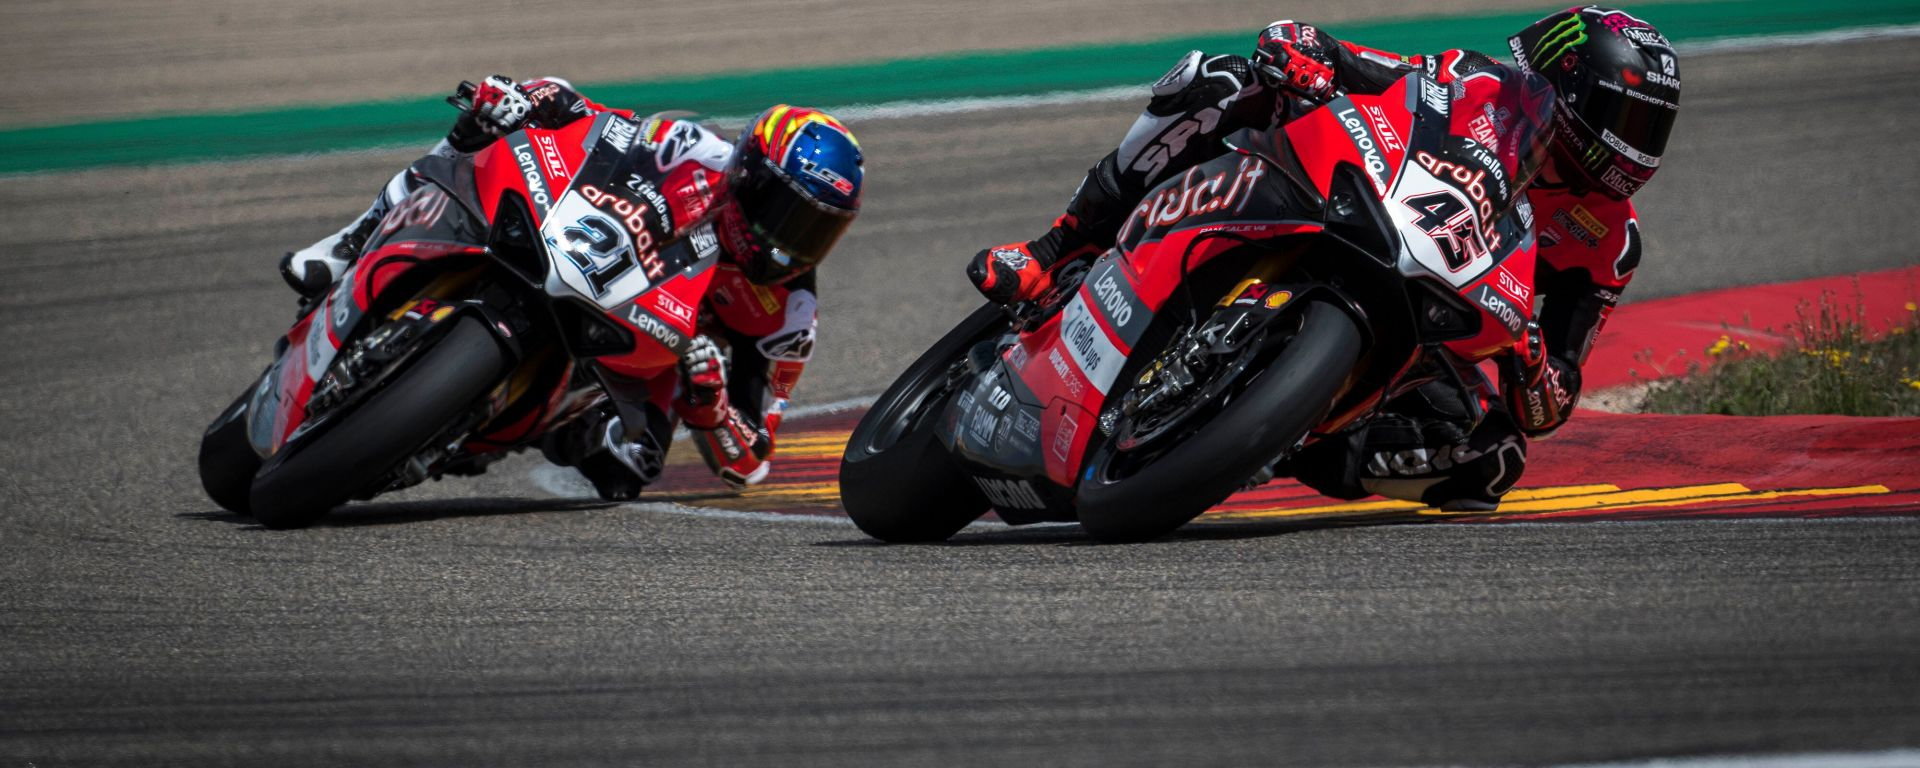 DRE Champs Day: gira in pista a Misano insieme ai piloti Ducati